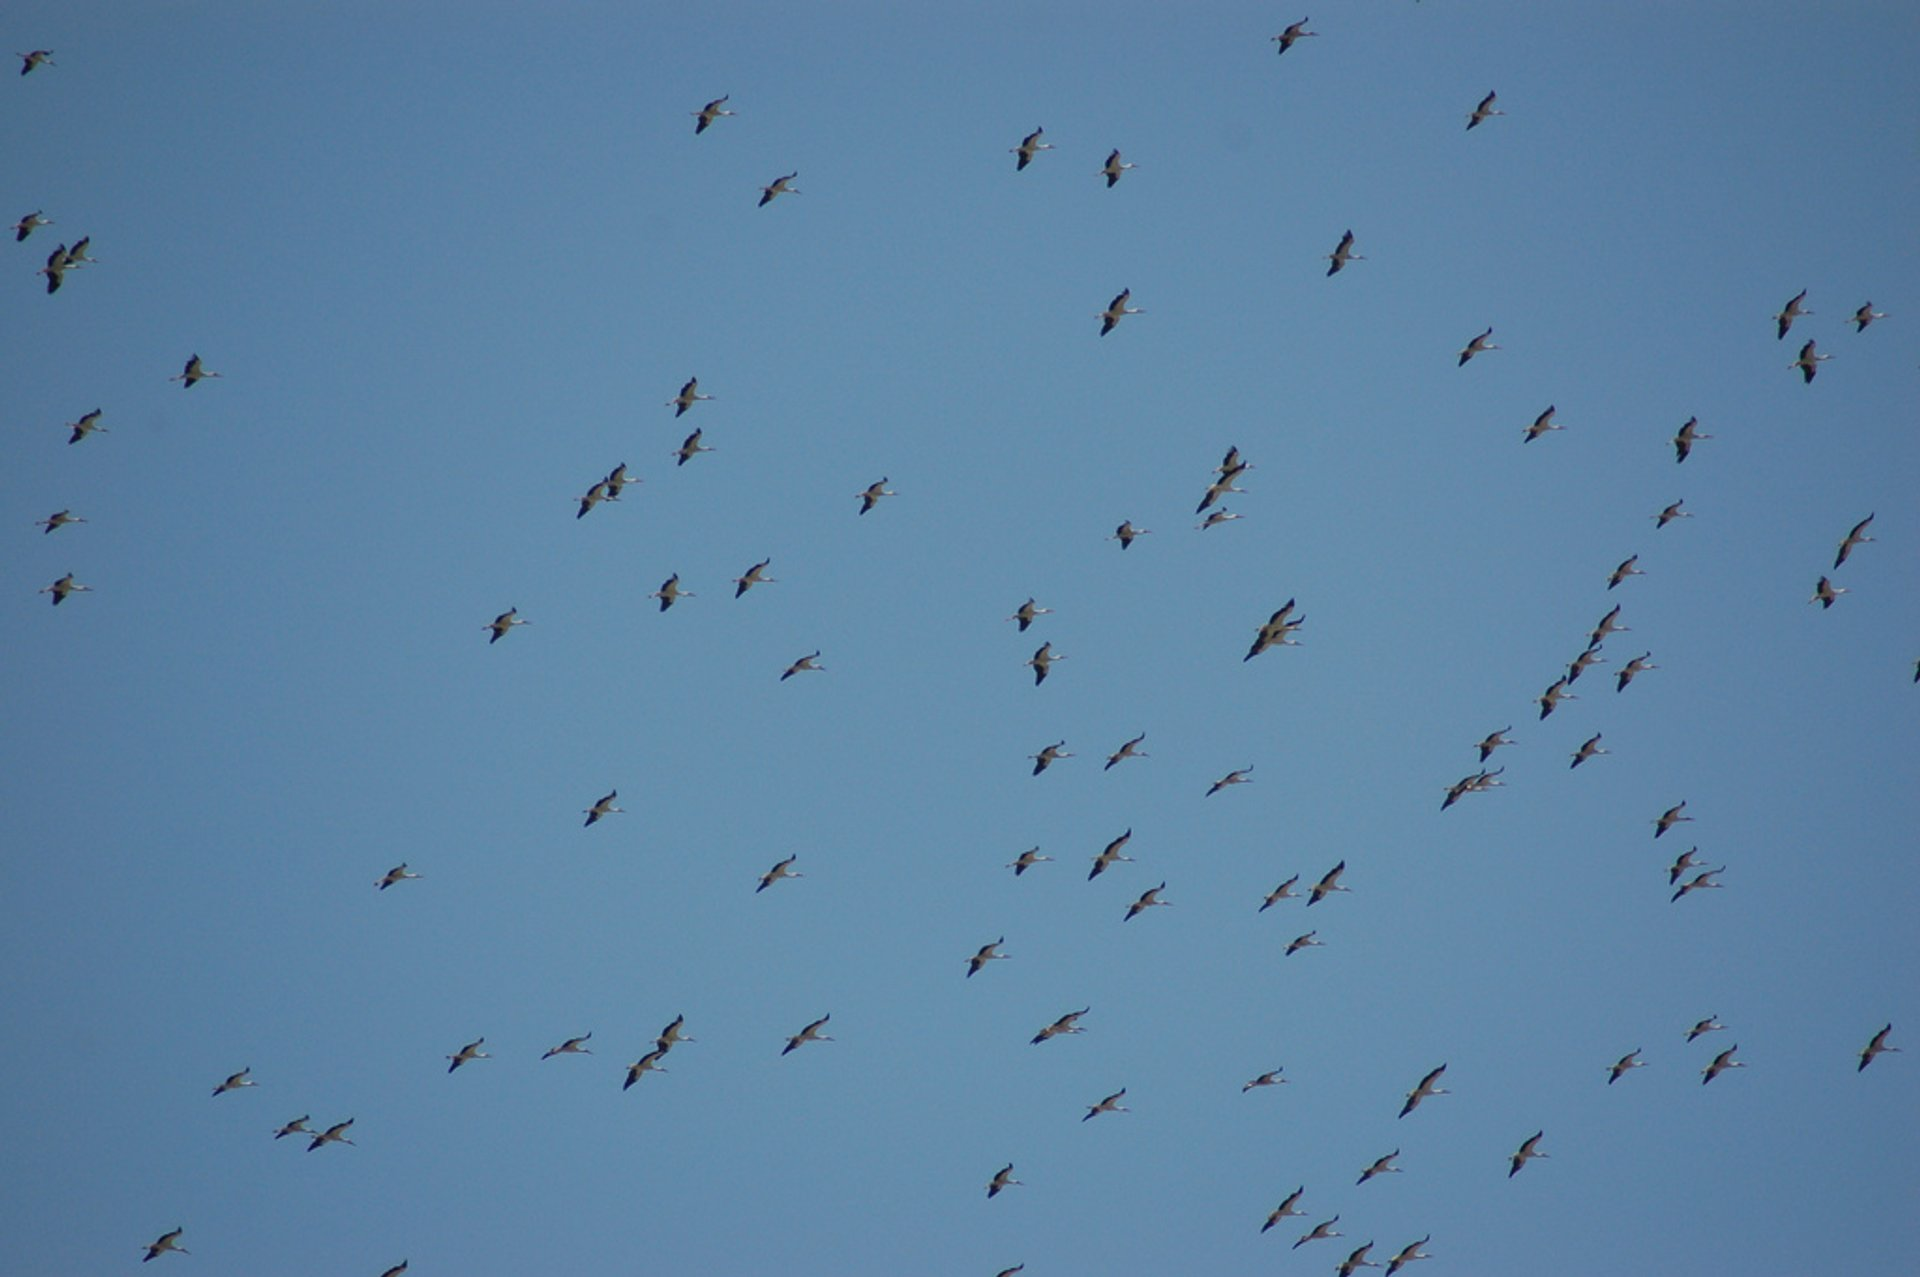 White Stork Migration in Israel 2019 - Best Time